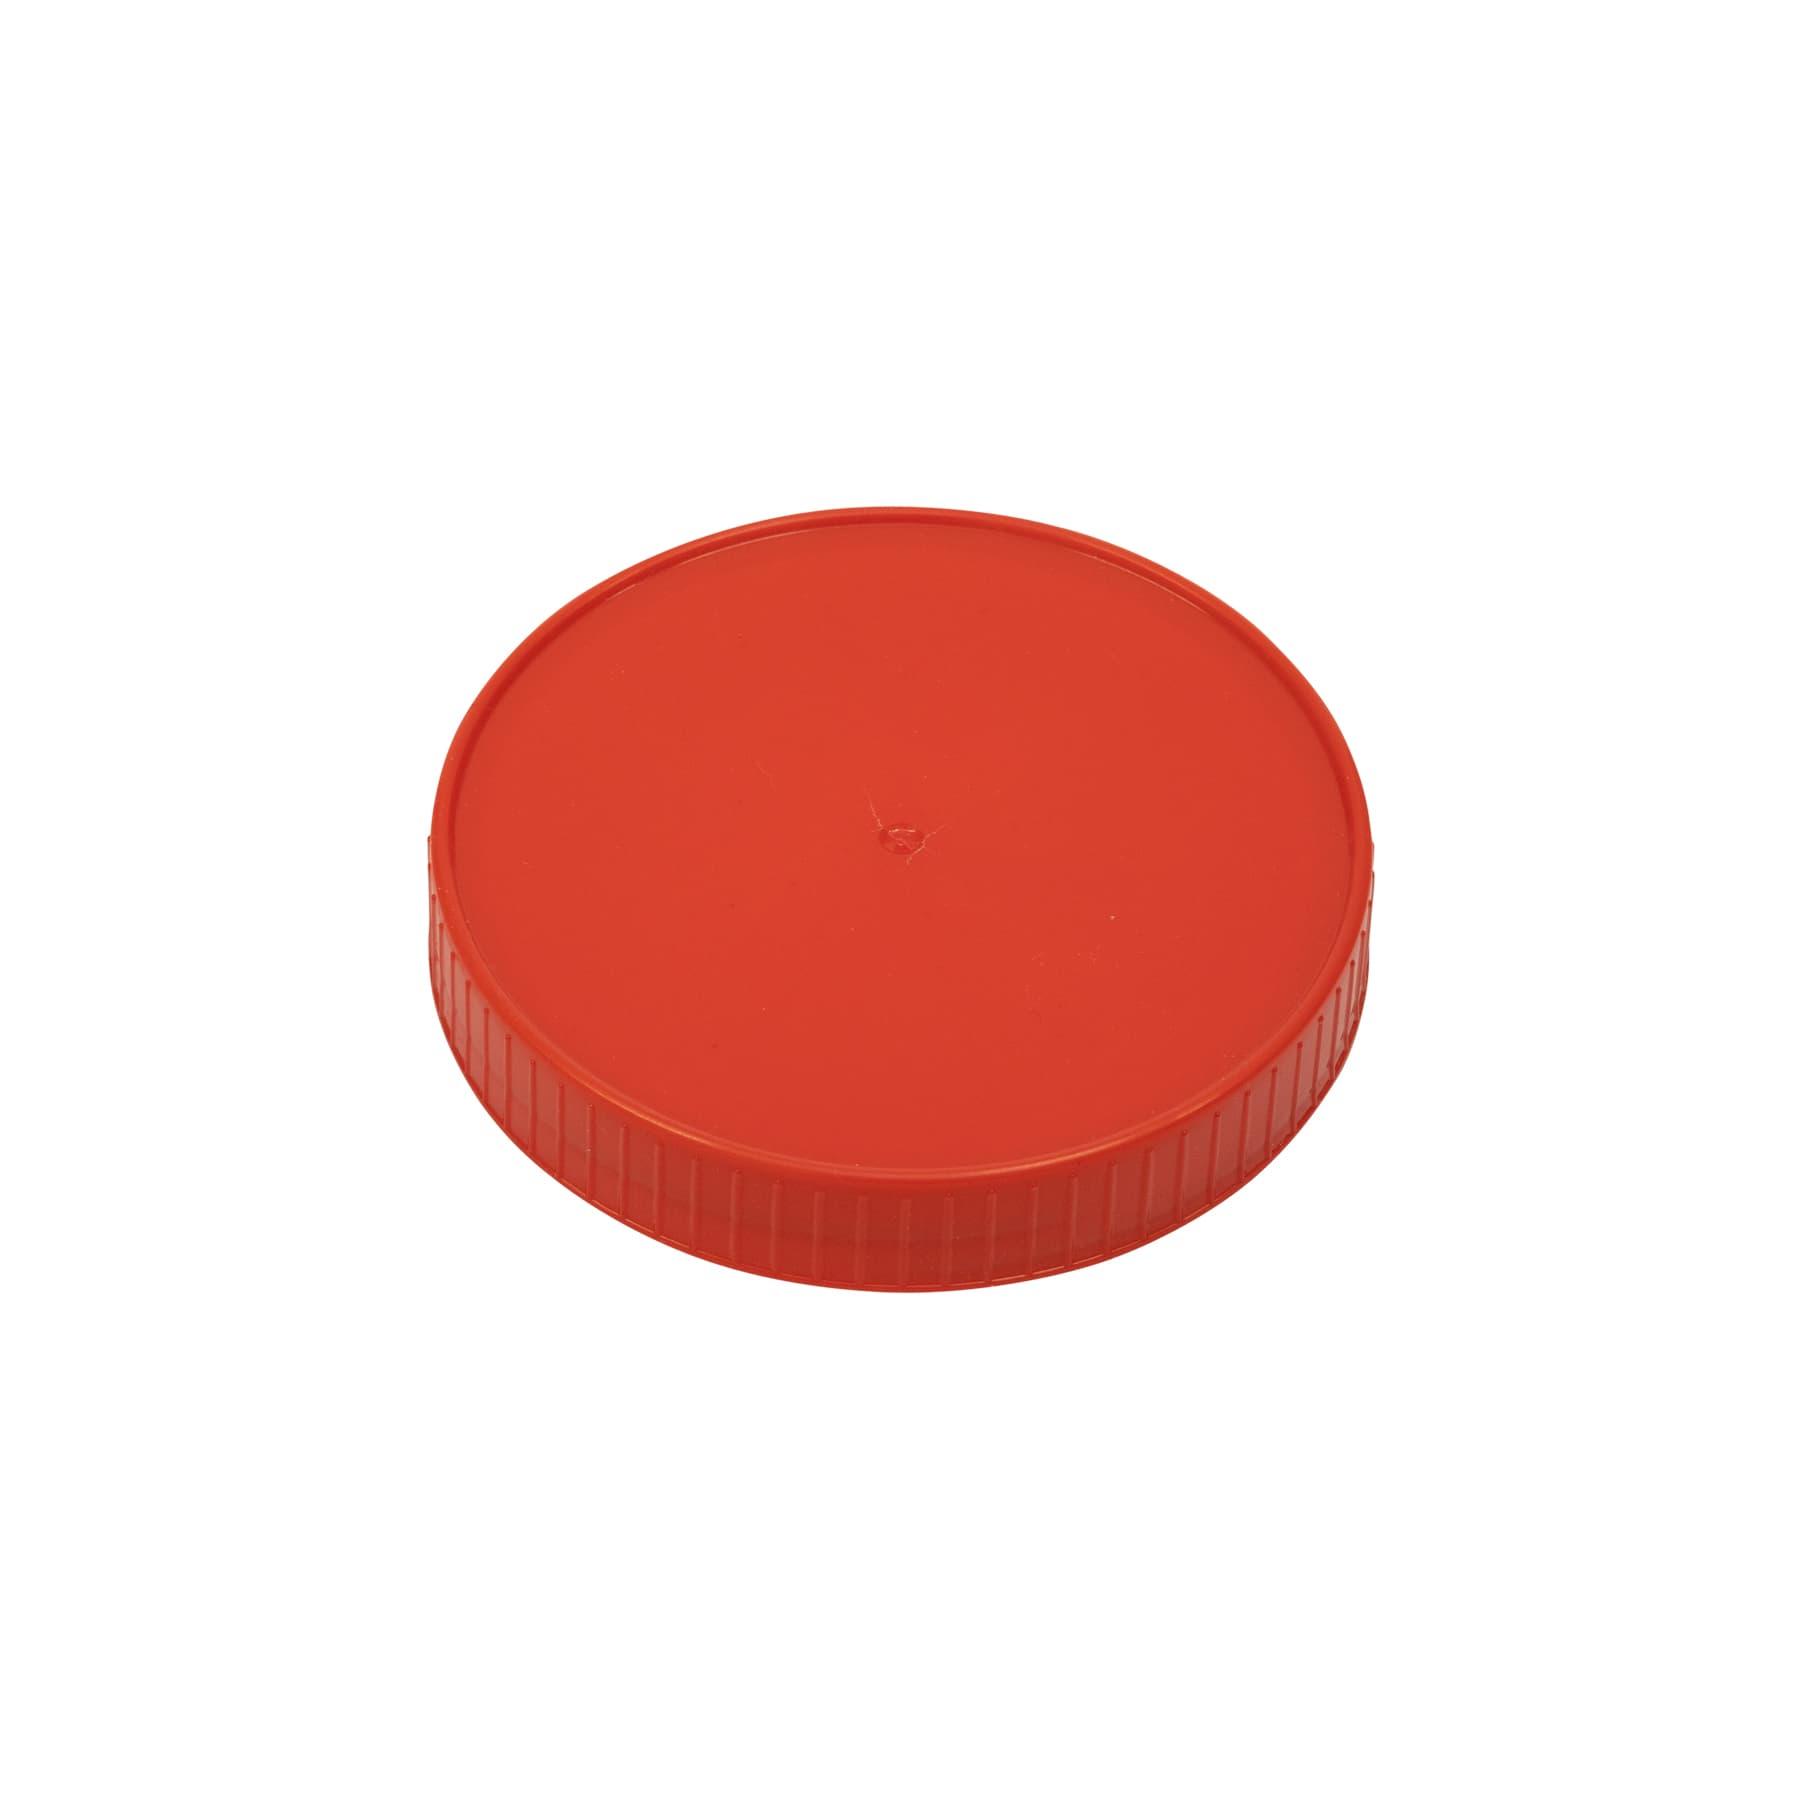 Schraubdeckel Kunststoff 80 mm, rot